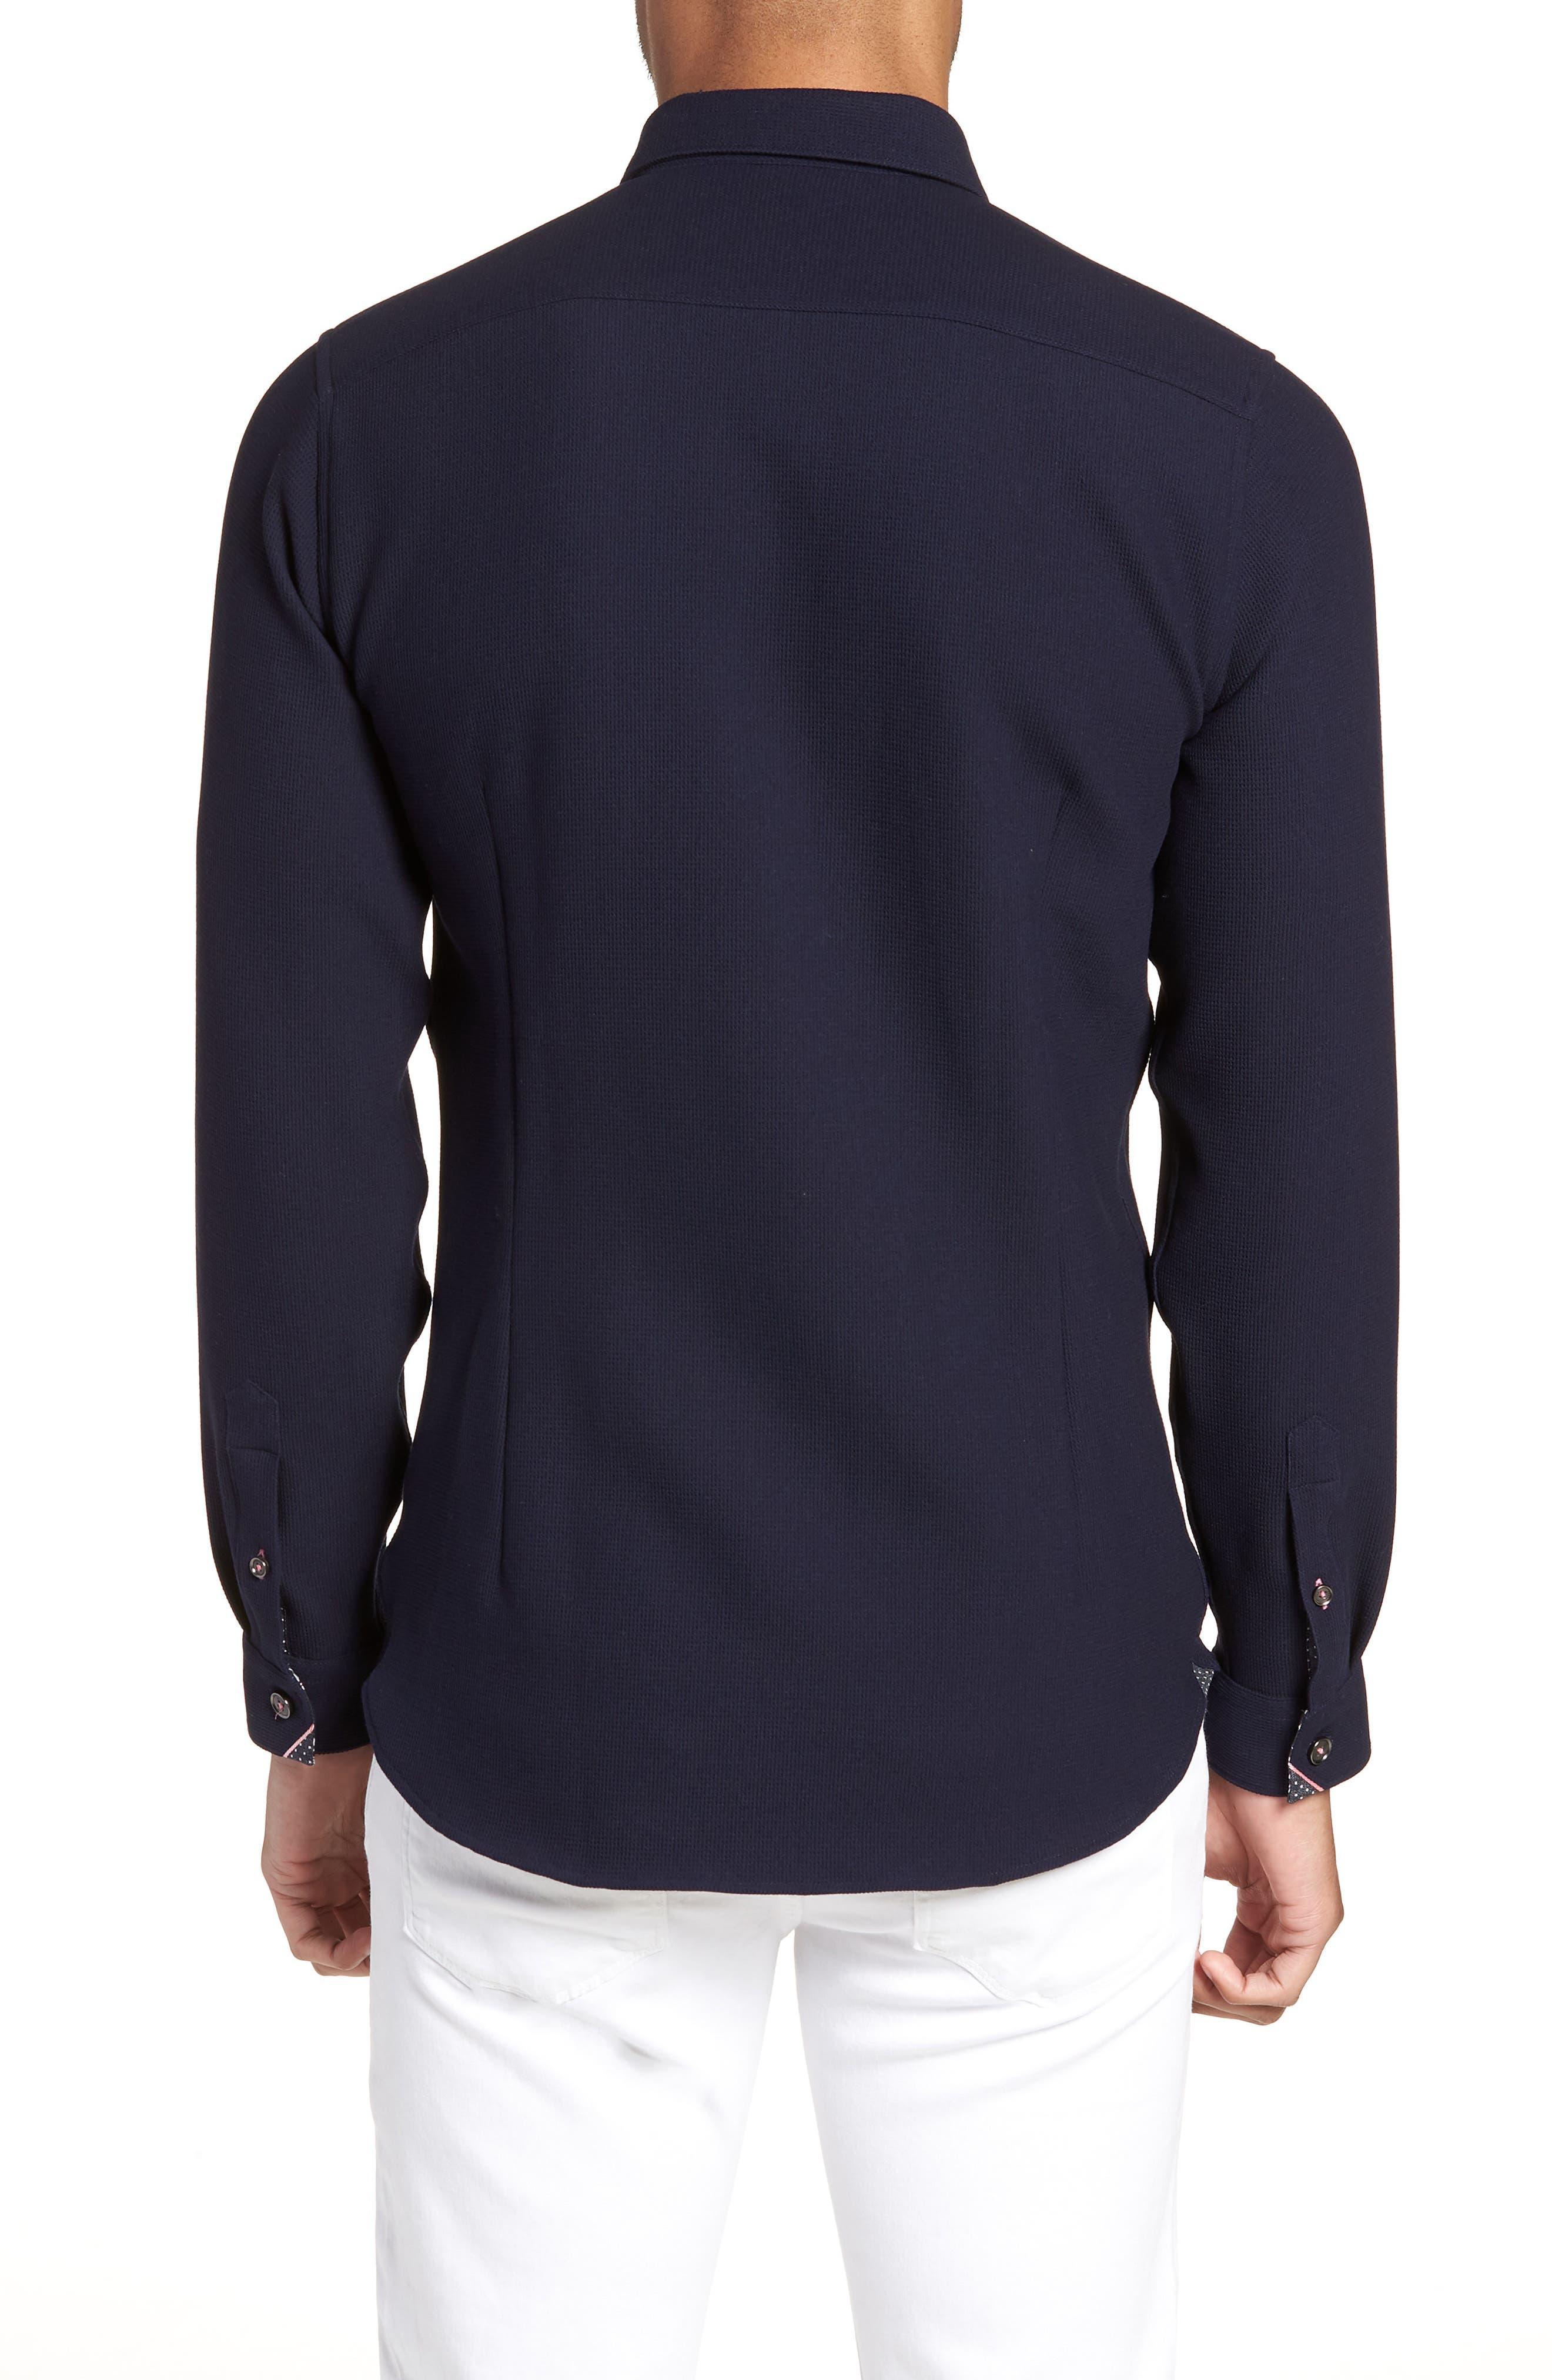 Loretax Trim Fit Stretch Knit Sport Shirt,                             Alternate thumbnail 2, color,